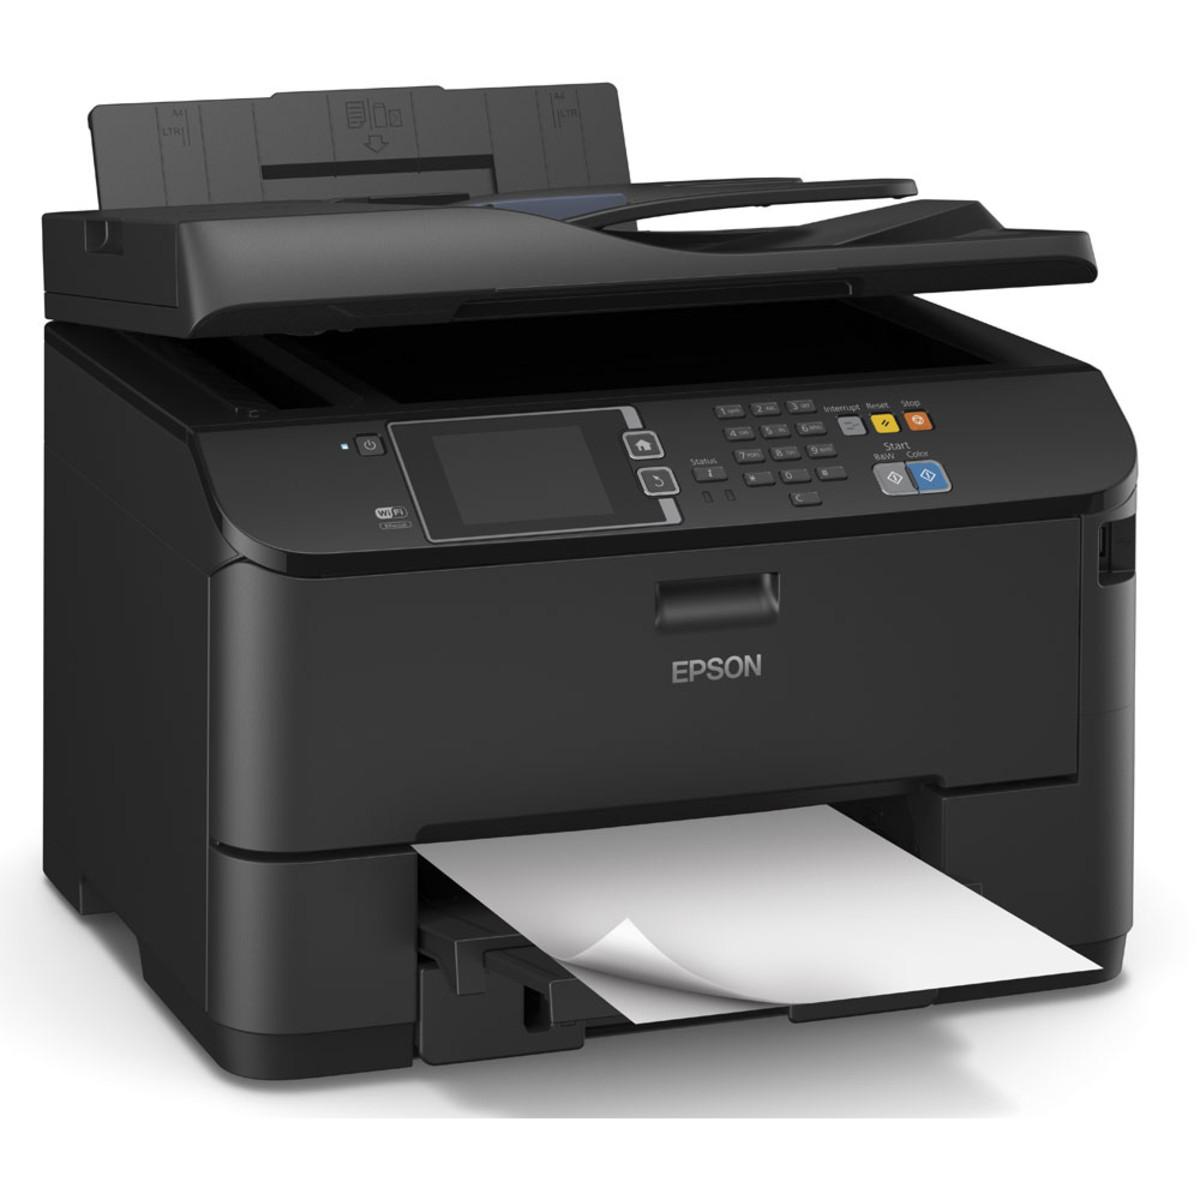 Epson WorkForce PRO WF4630 Inkjet Printer